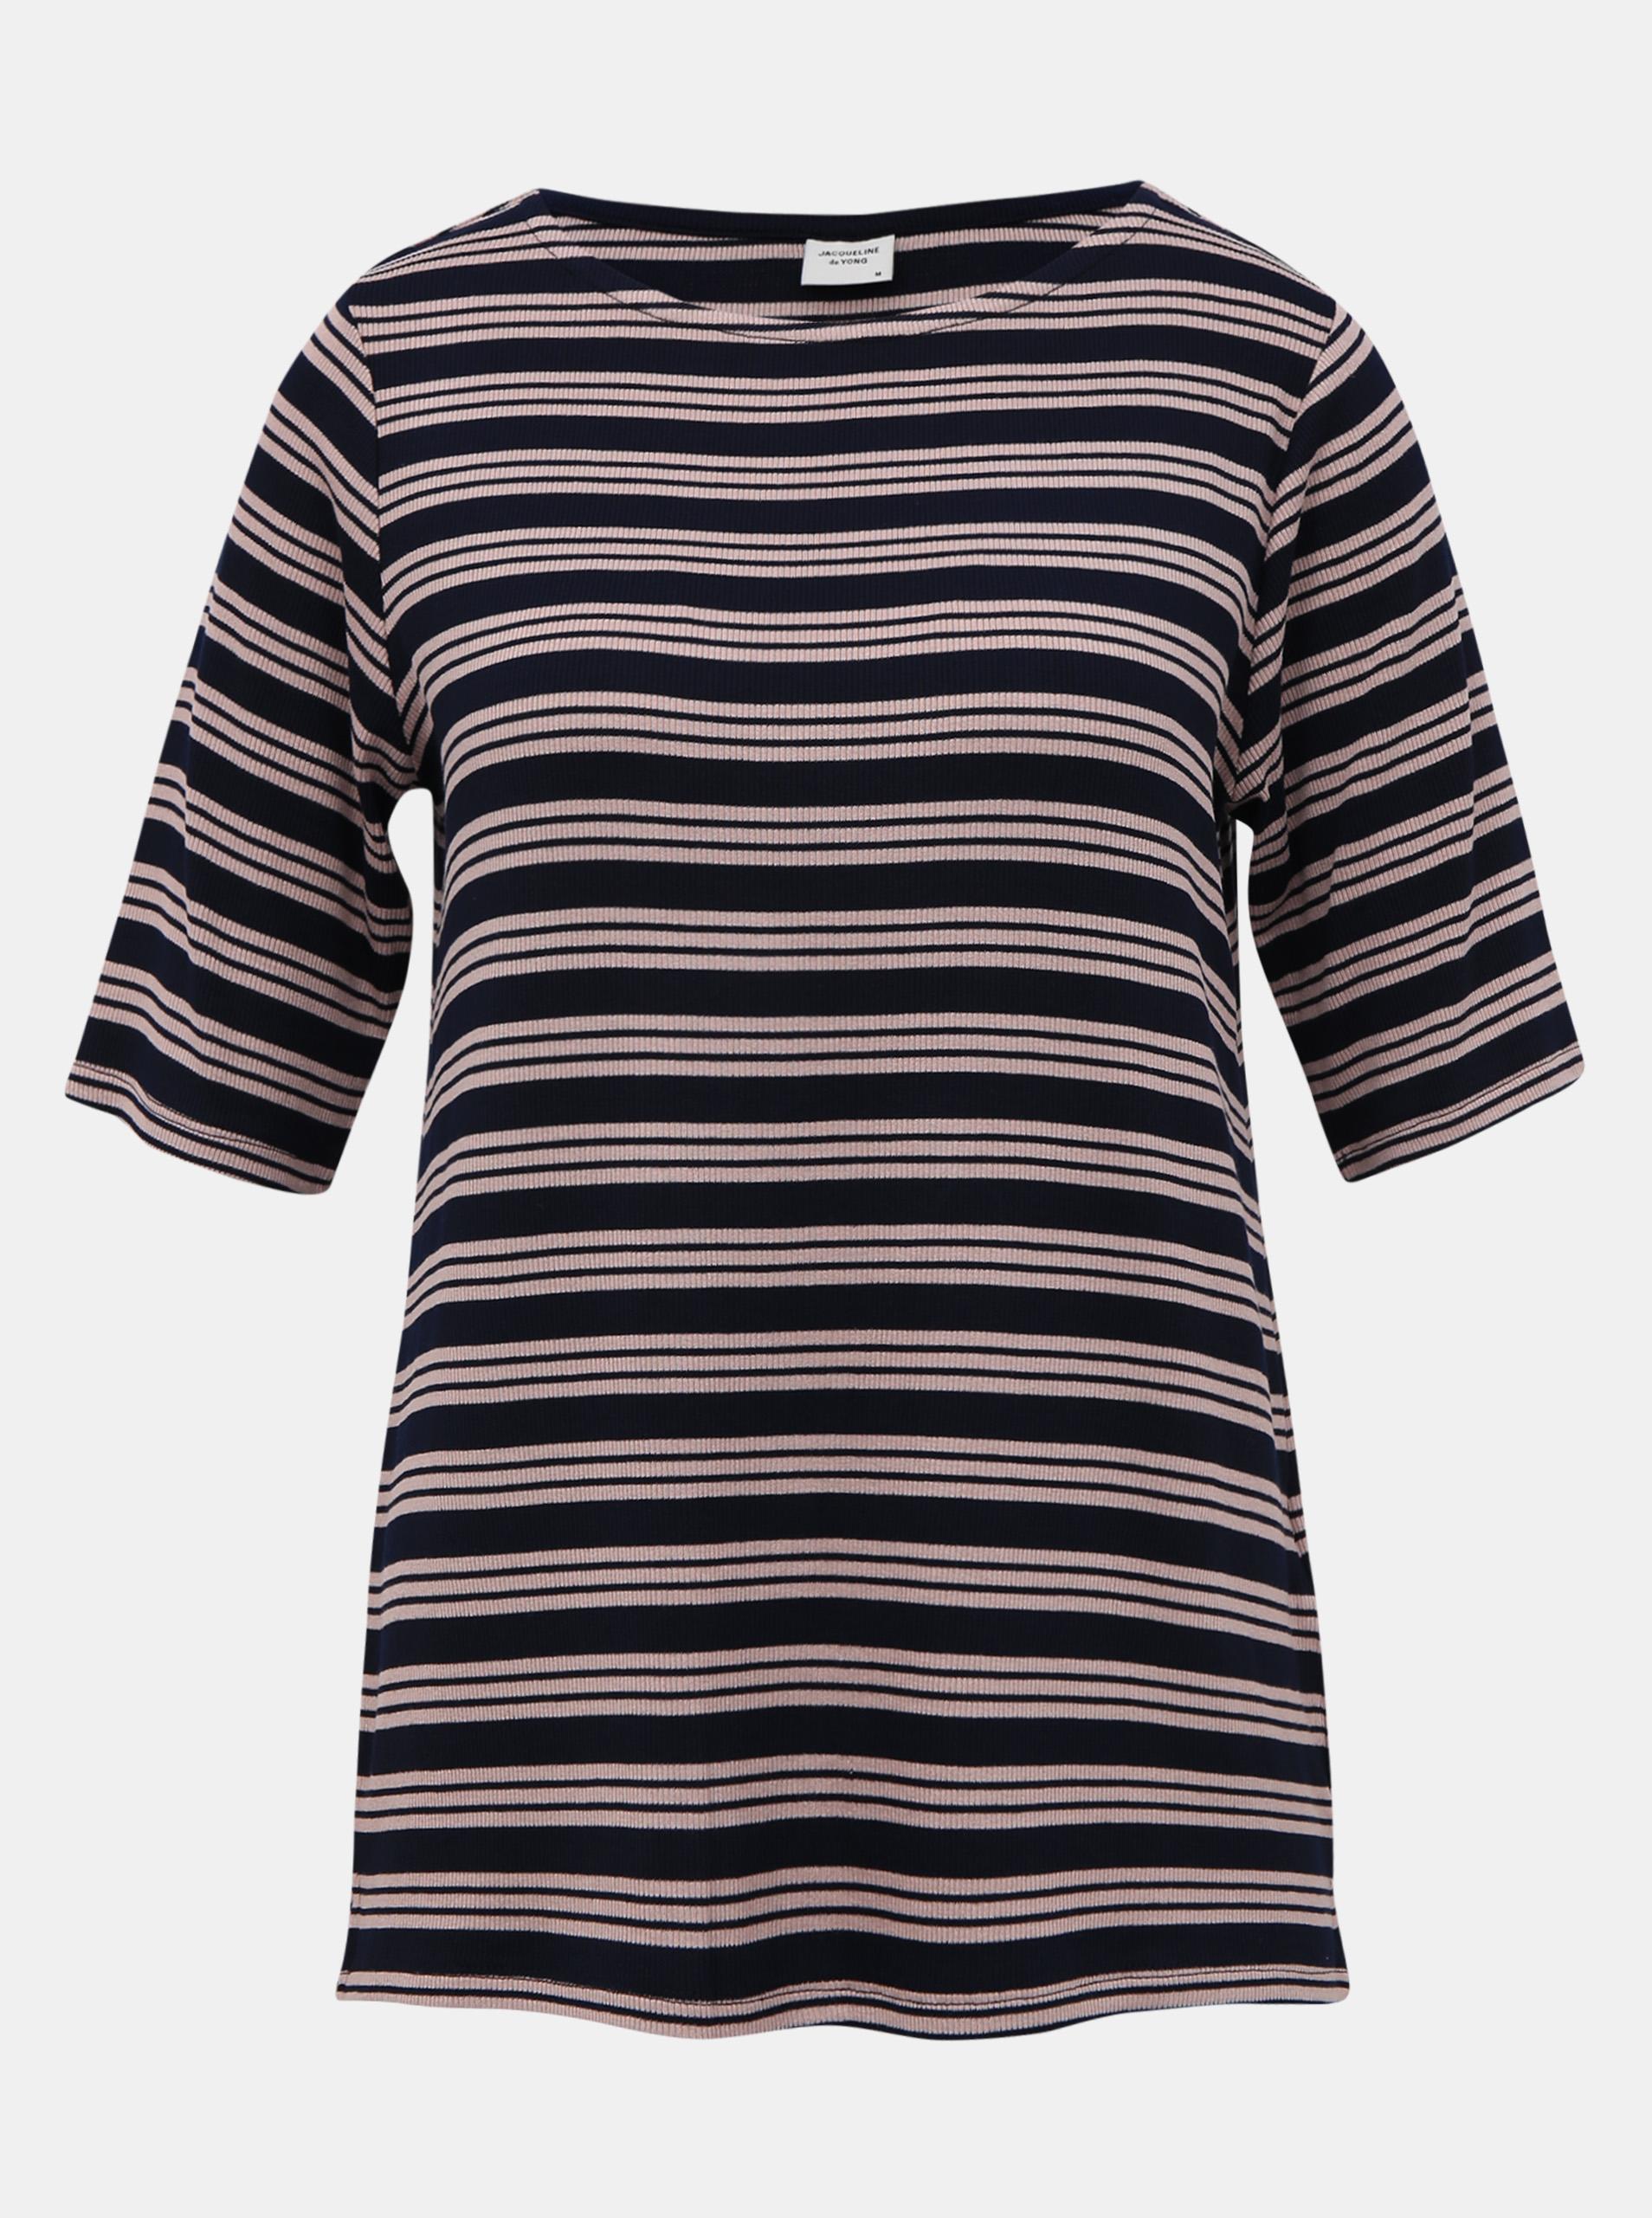 Granatowa koszulka w paski Jacqueline de Yong Camina